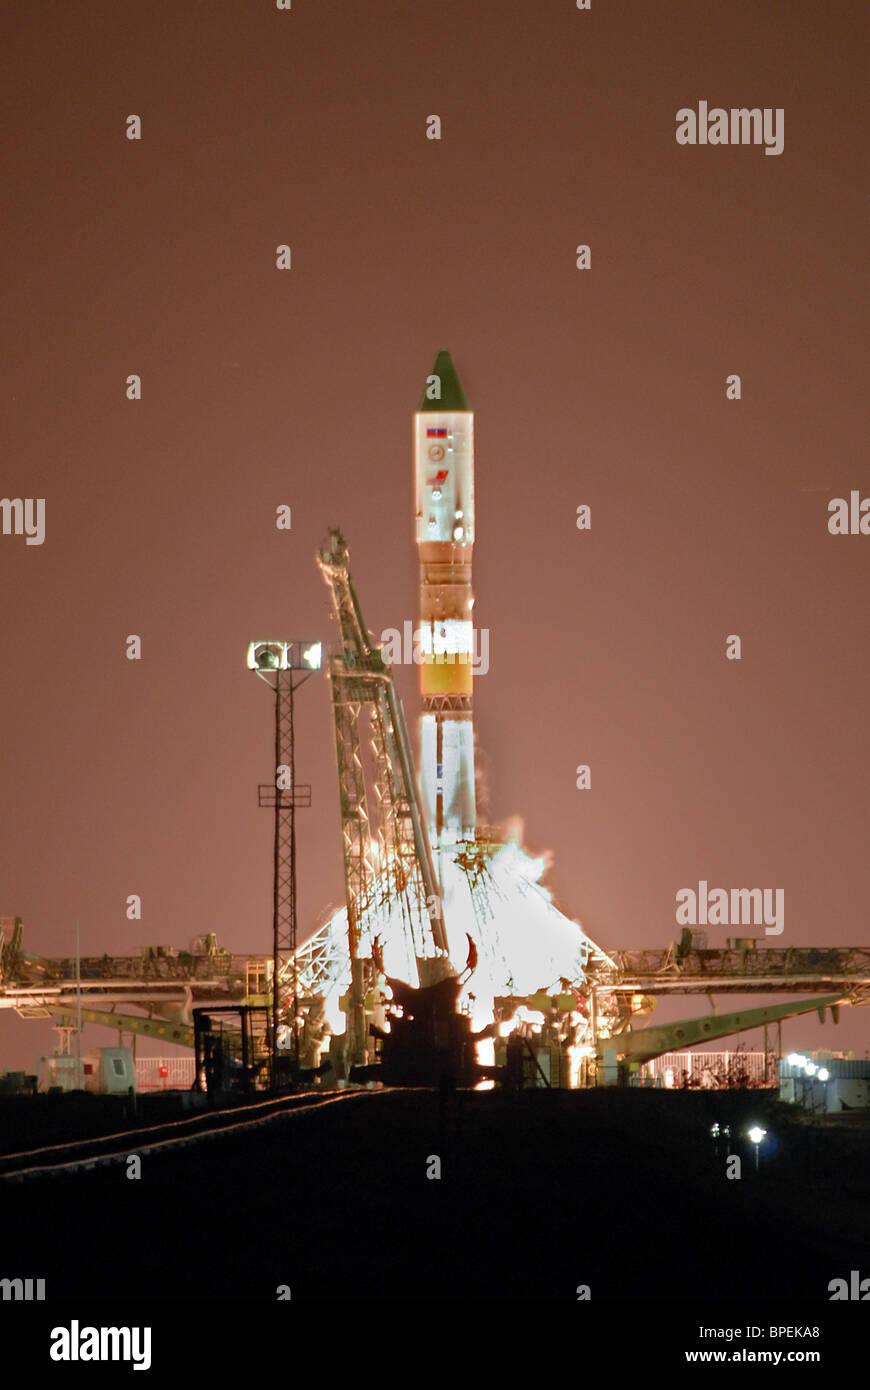 Progress M-64/29P cargo ship aboard Russian Soyuz-U carrier rocket launched from Baikonur Cosmodrome - Stock Image